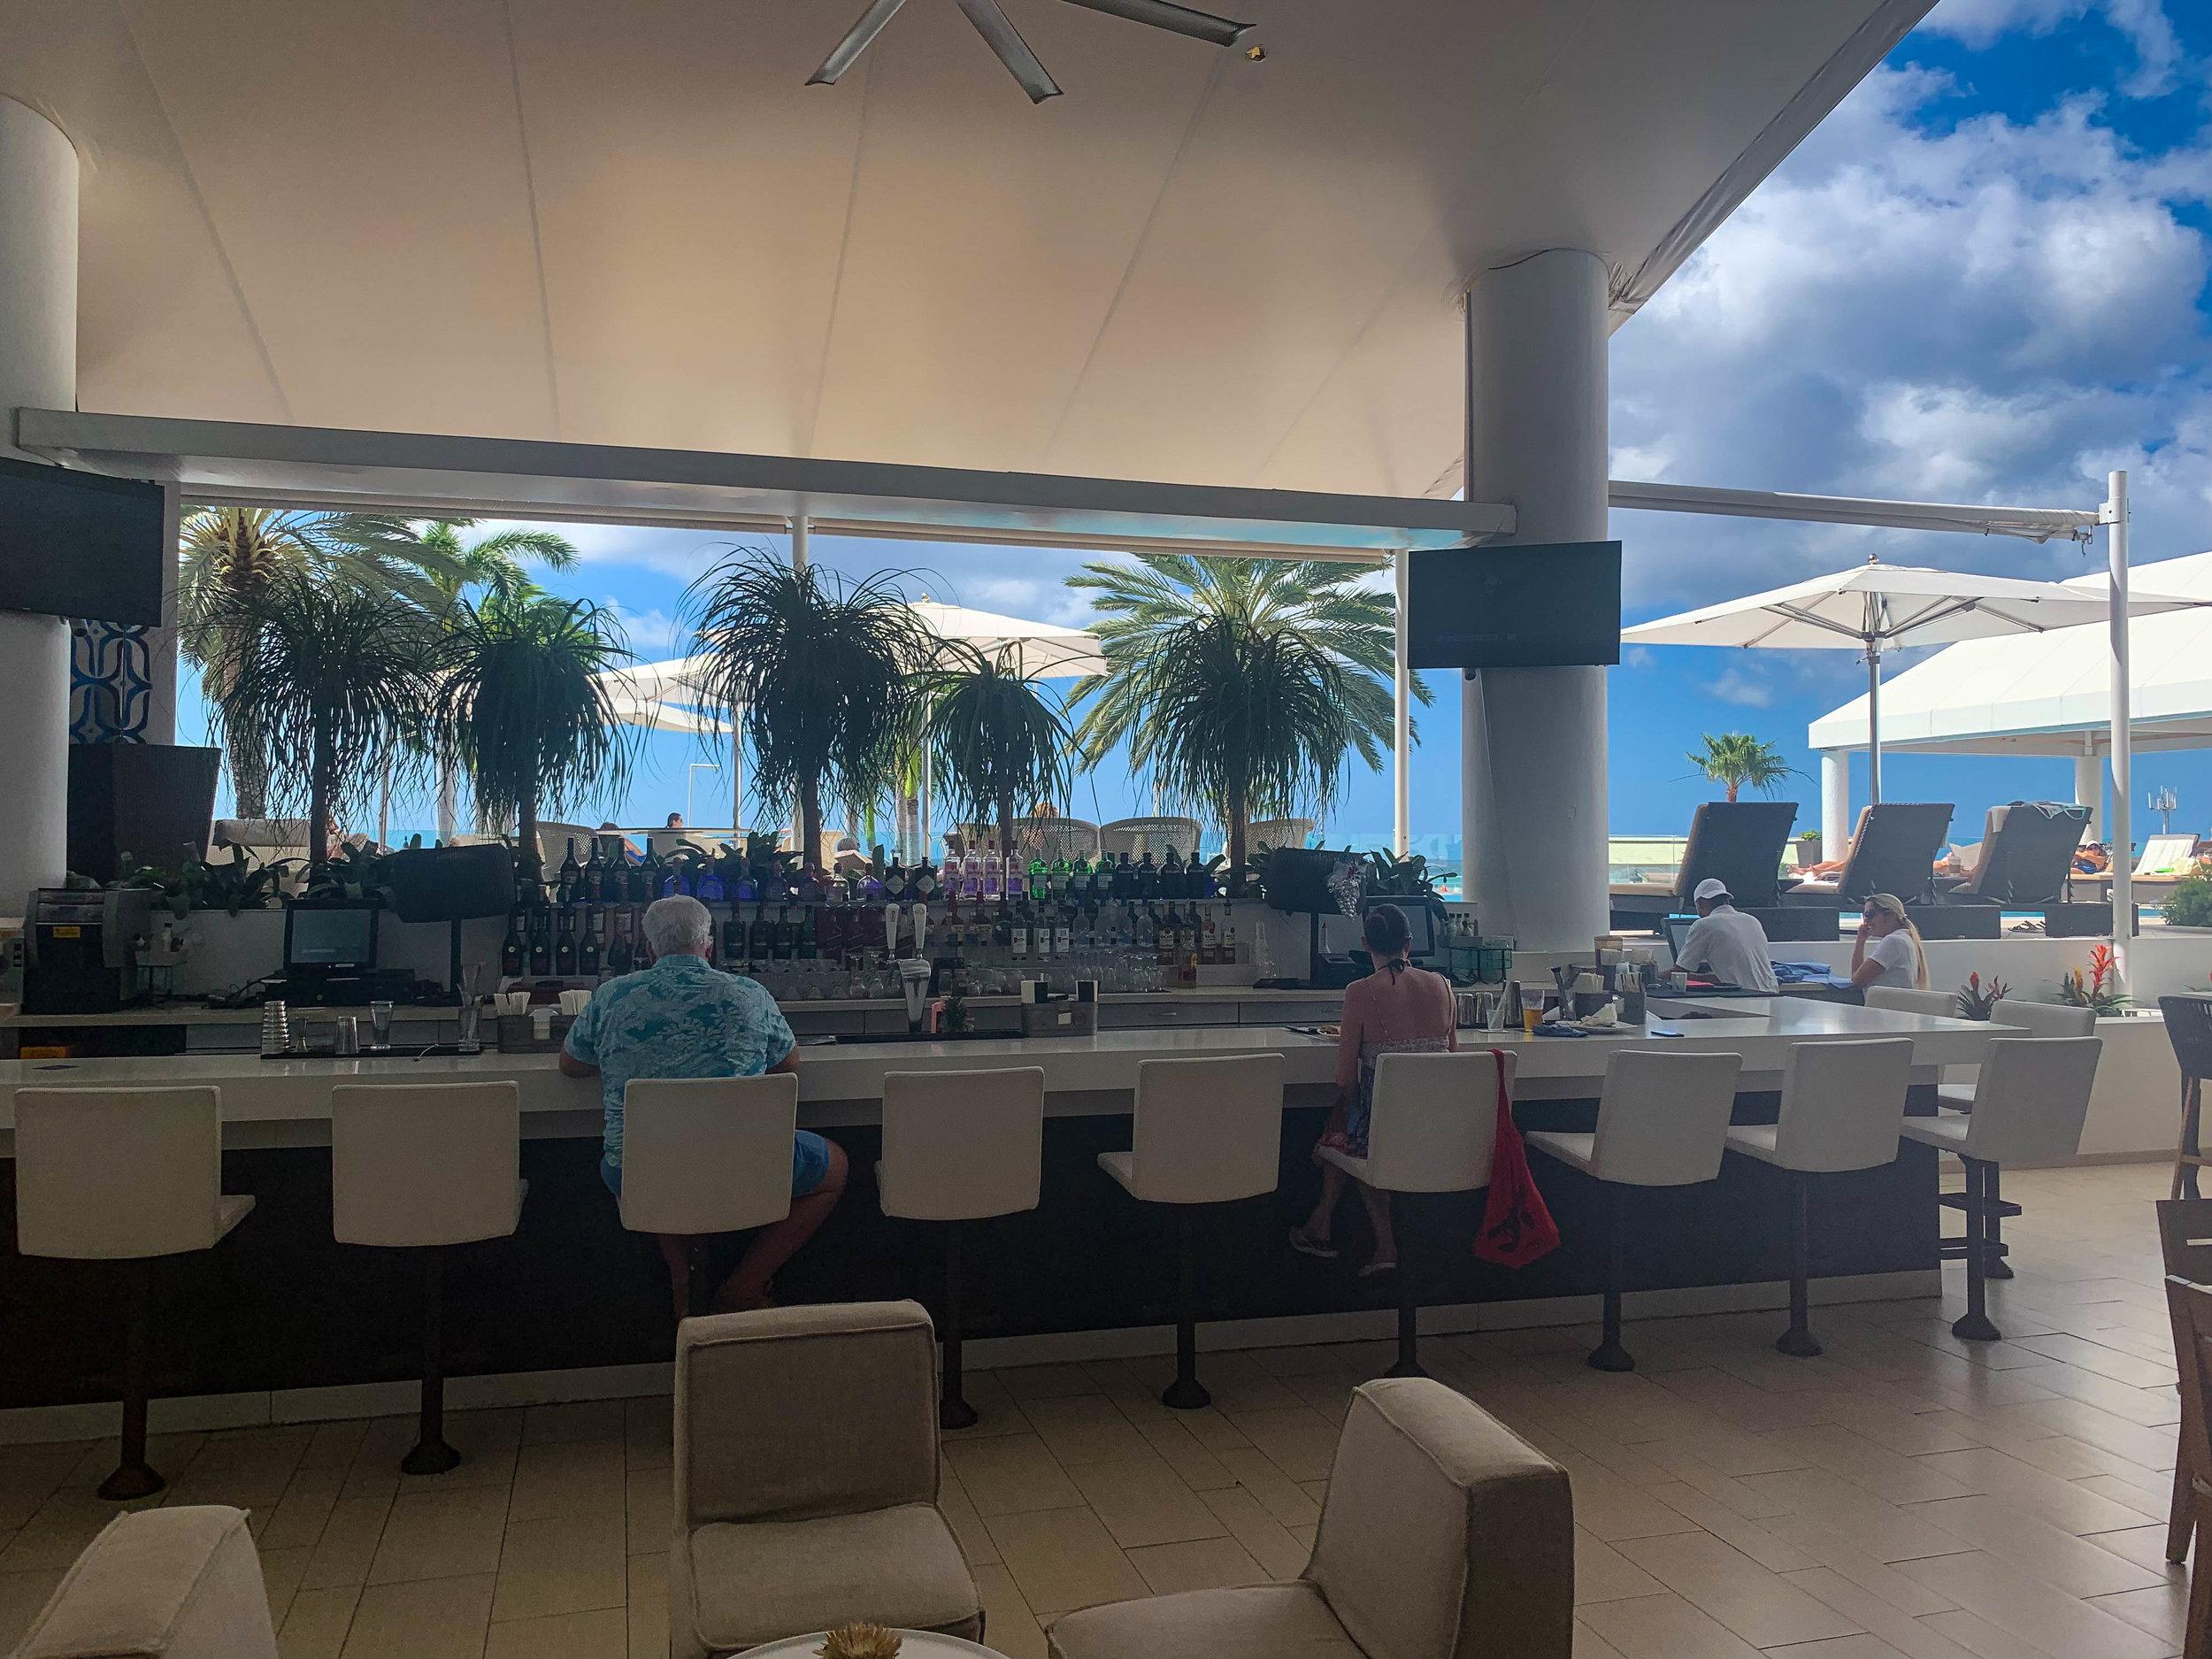 Renaissance_Aruba_Hotel.jpg